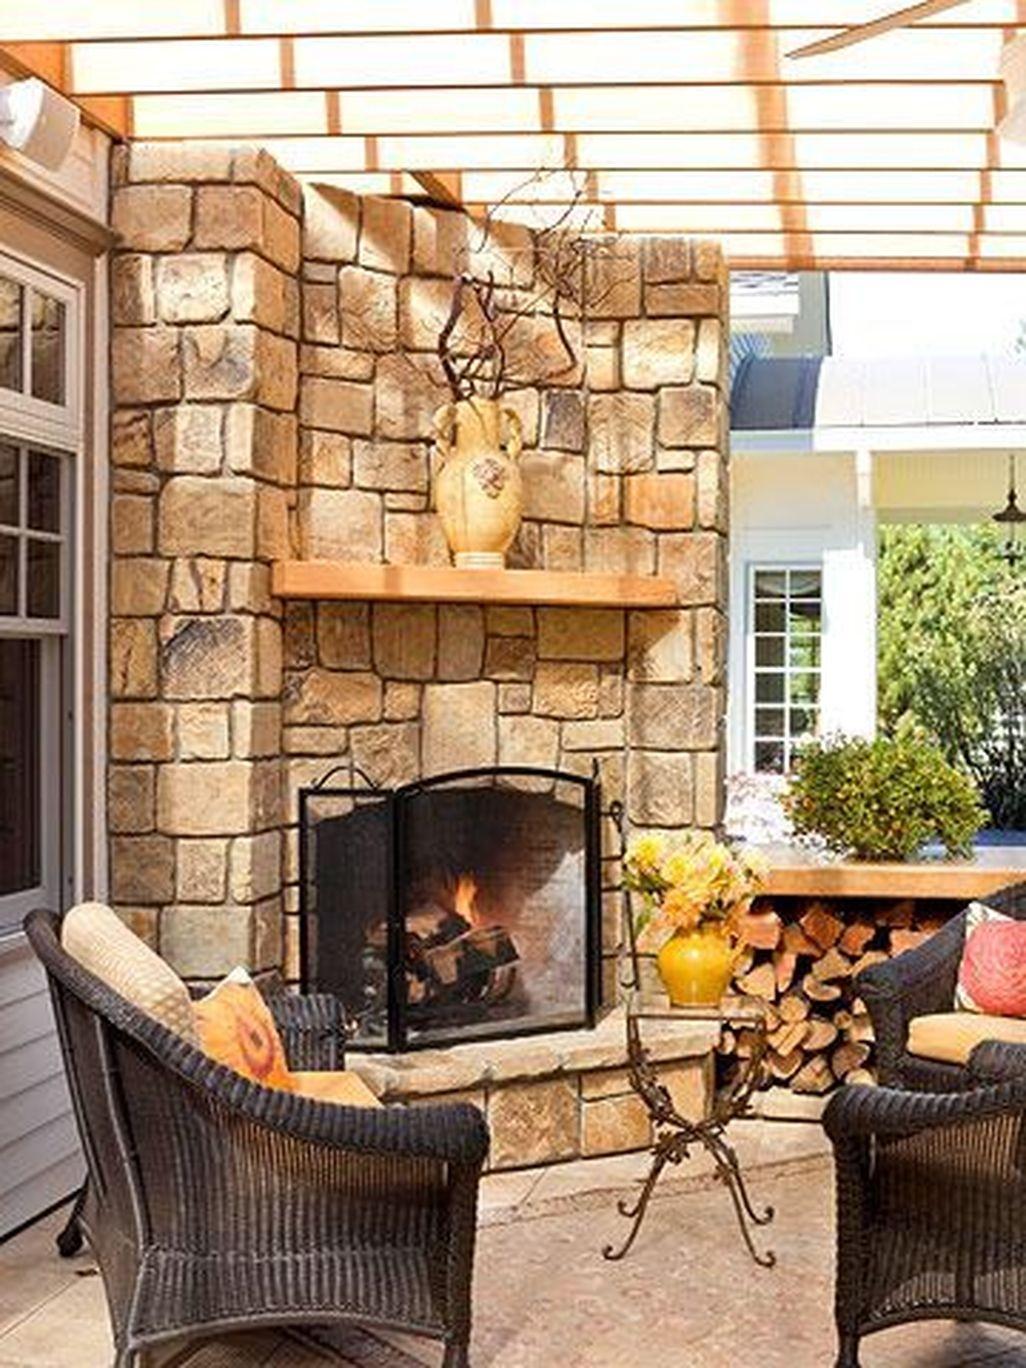 Inspiring Corner Fireplace Ideas In The Living Room 30